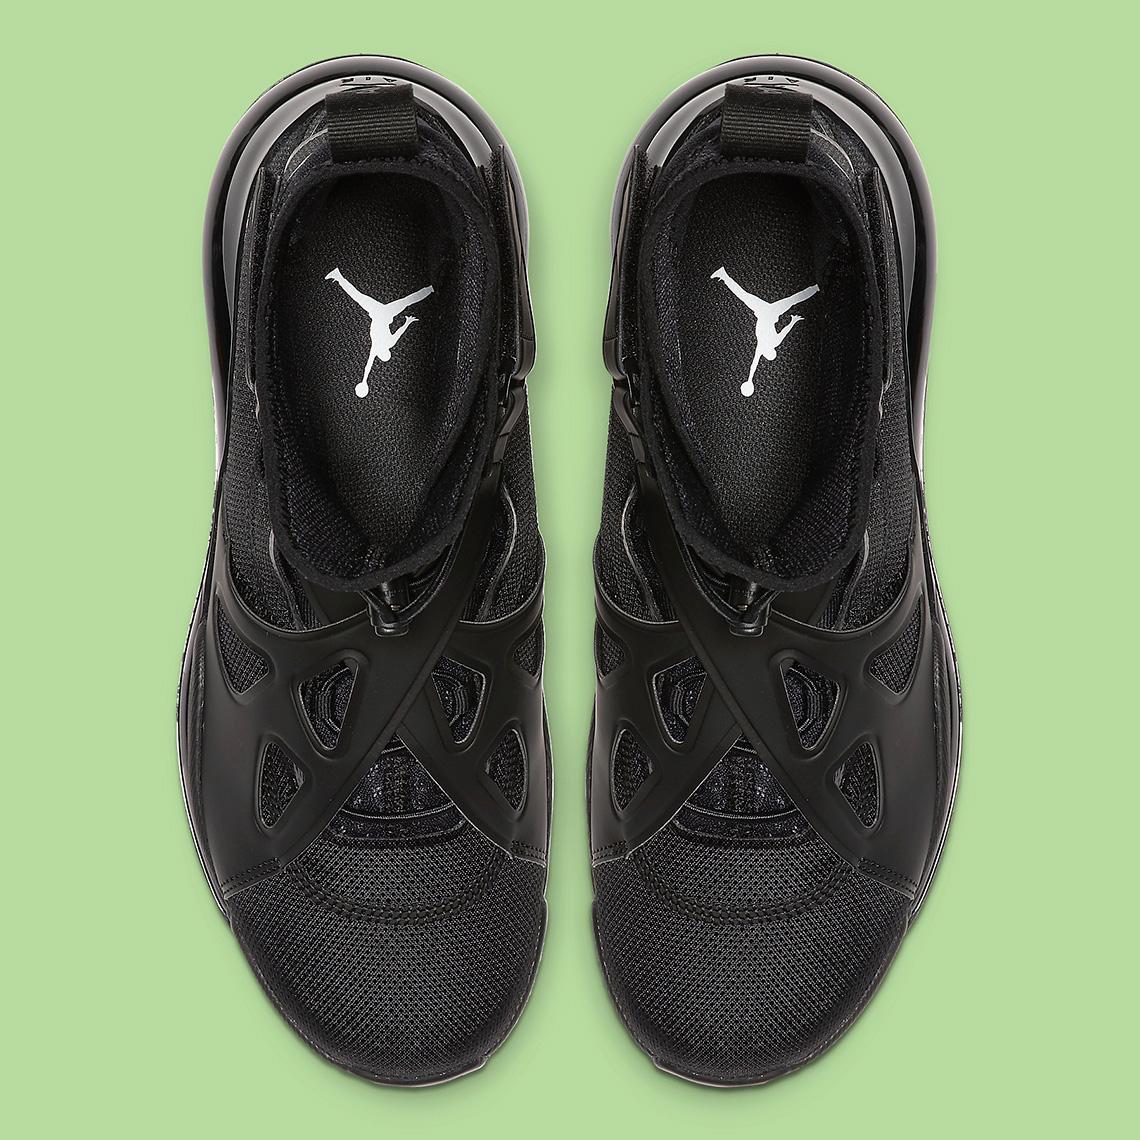 Jordan Air Latitude 720 Triple Black (W)